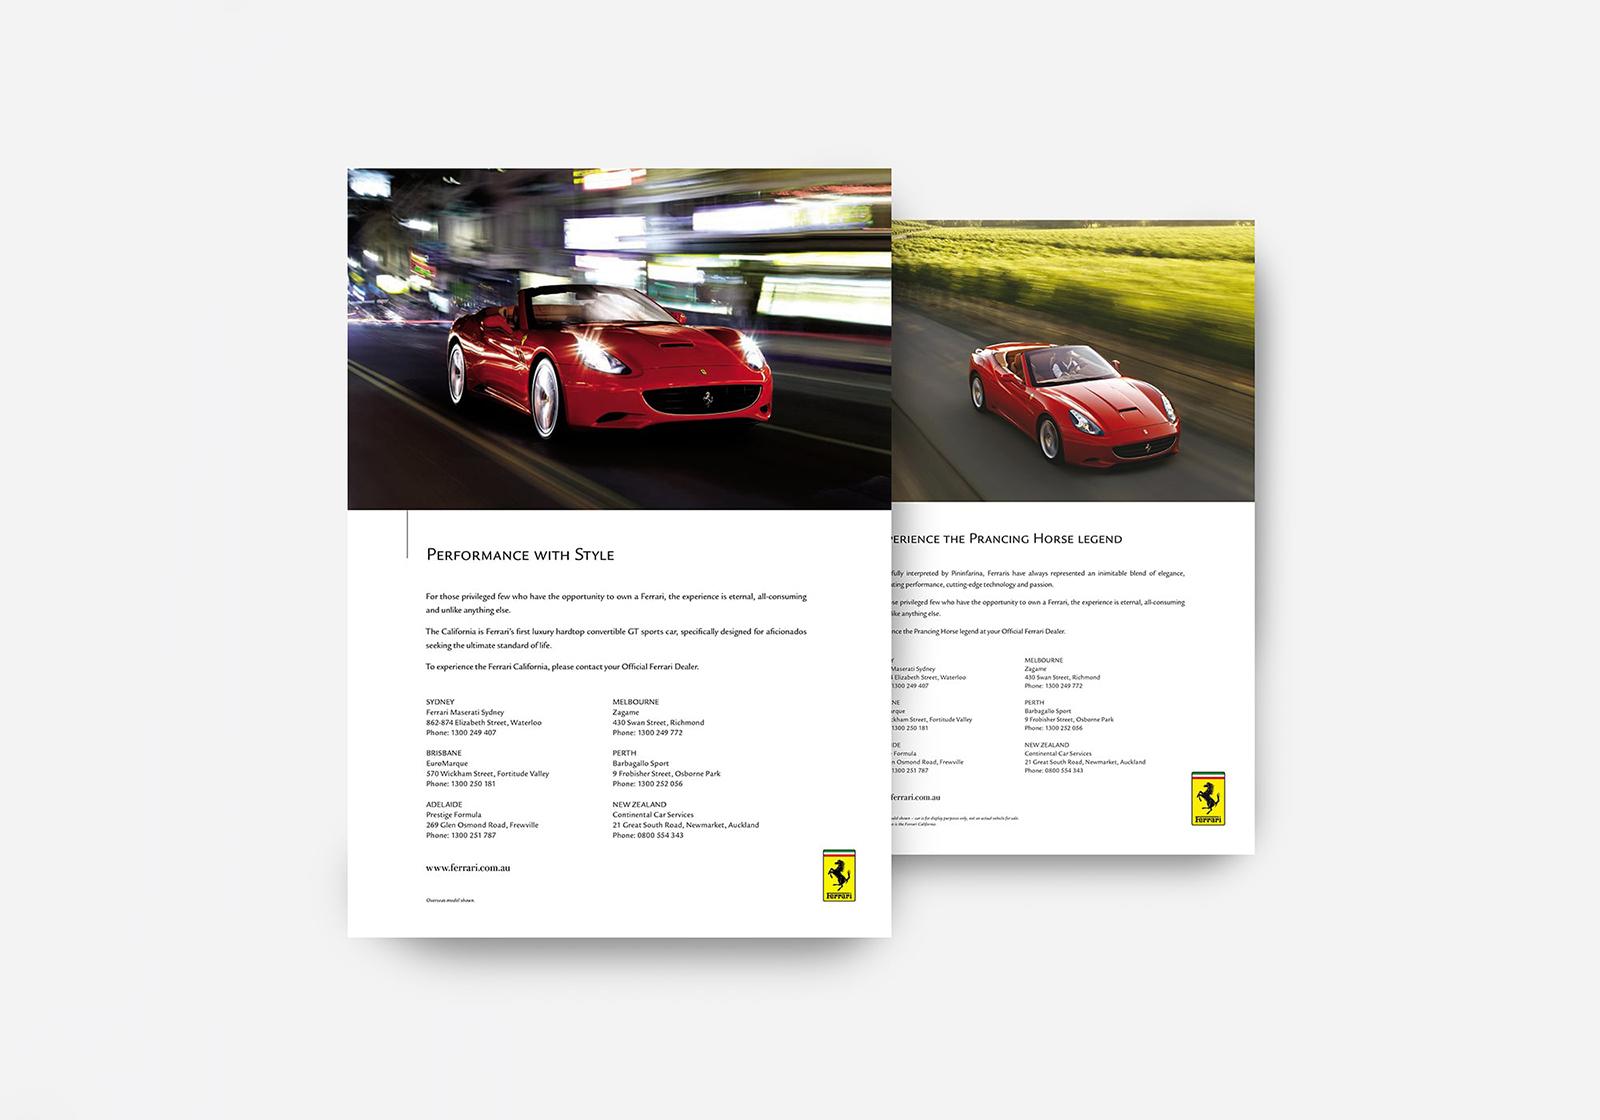 Ferrari-AMEX-Centurion-ad_Sept2011-min